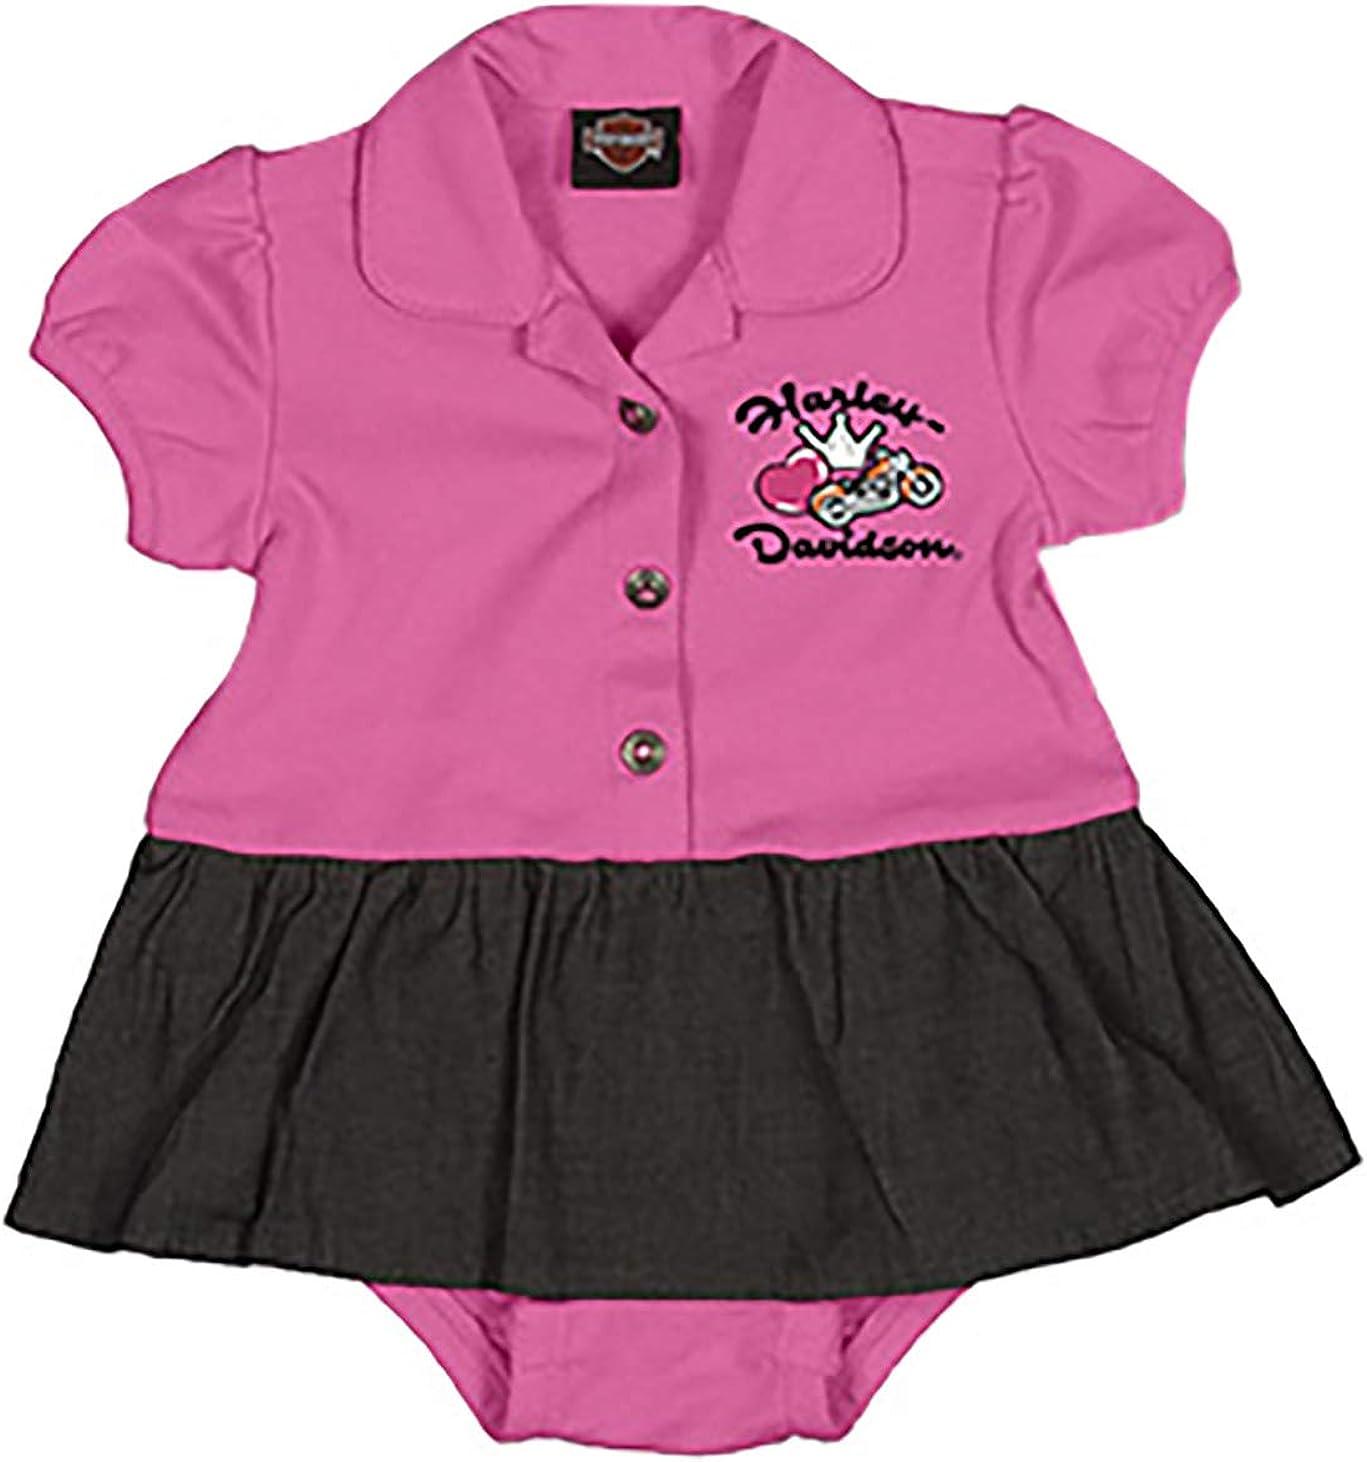 Harley-Davidson Baby Girls Princess Creeper Set 2 Pack Pink//White 3000557